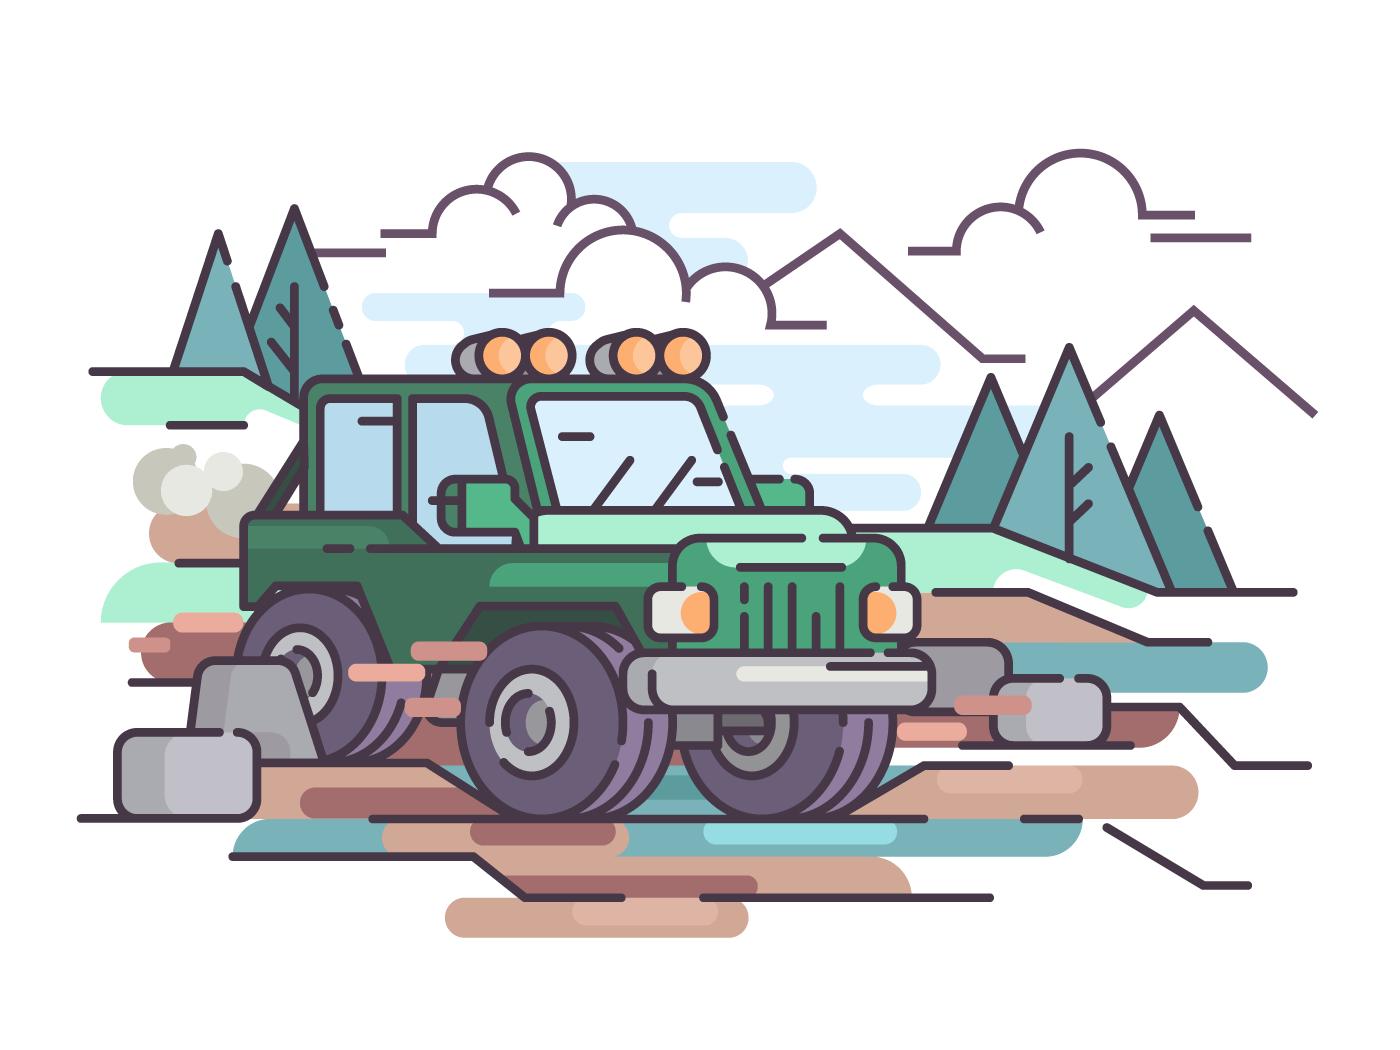 Journey on car off-road vehicle on impassability. Vector flat illustration